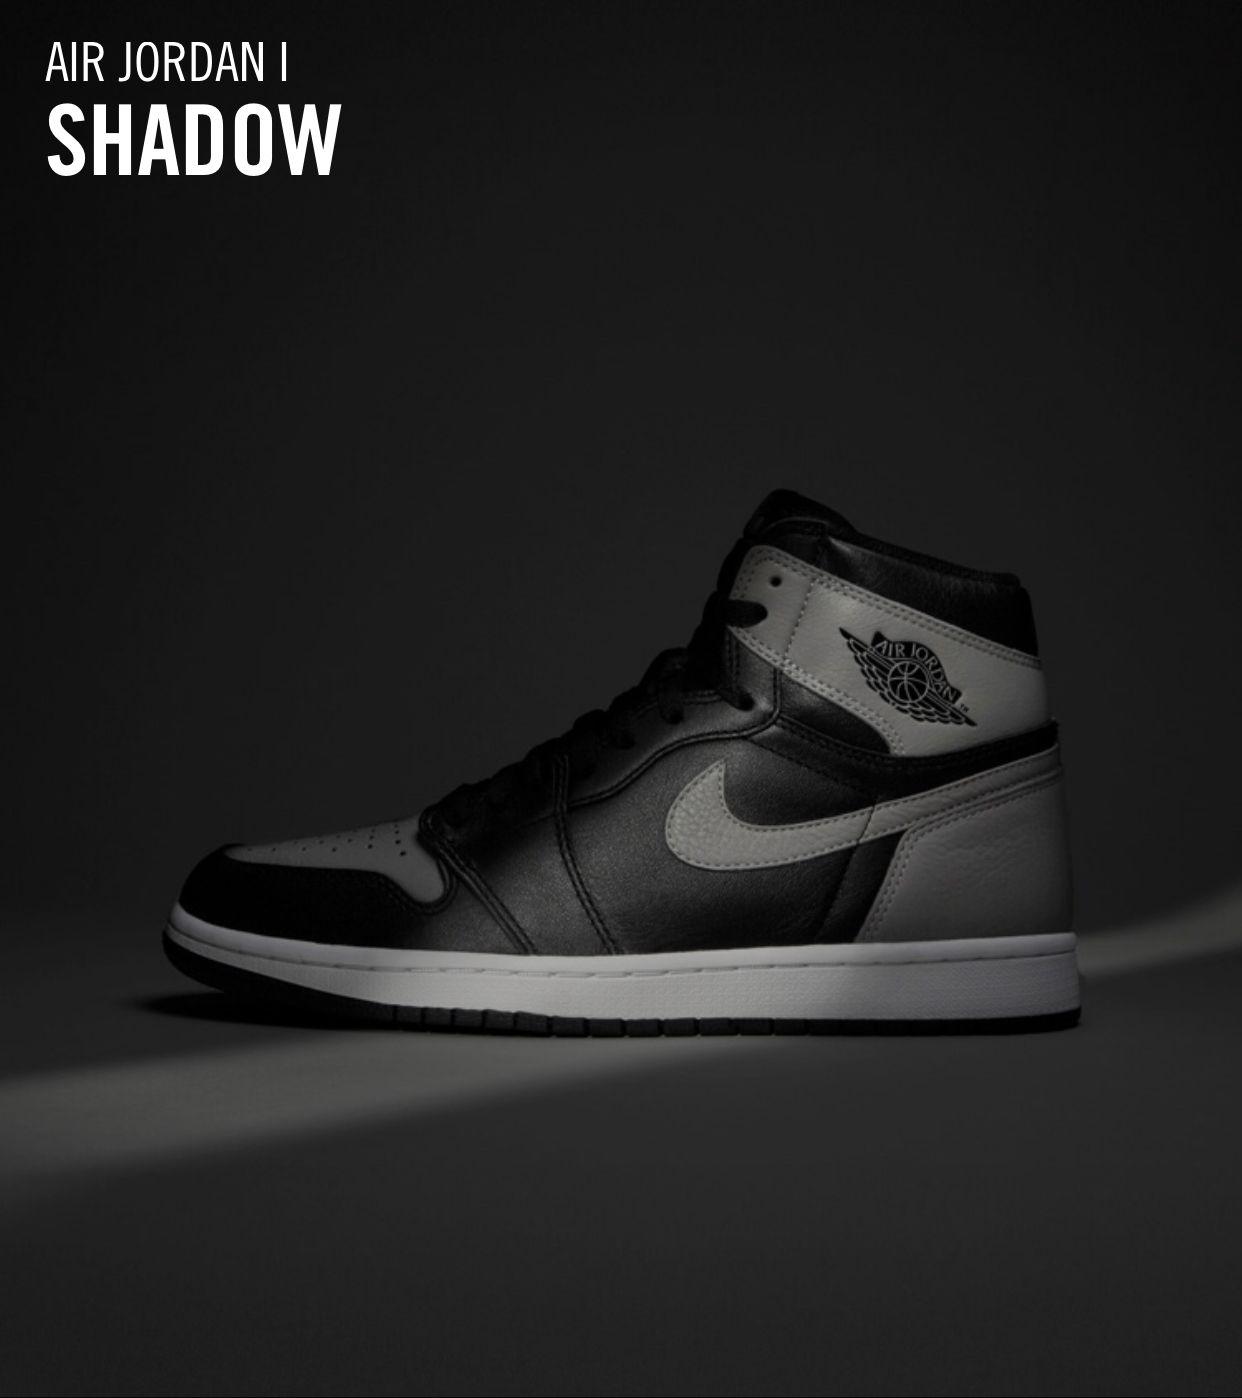 pretty nice 34eed 952b3 Discover ideas about Jordan Retro 1. Release Date  Air Jordan 1 Retro 93